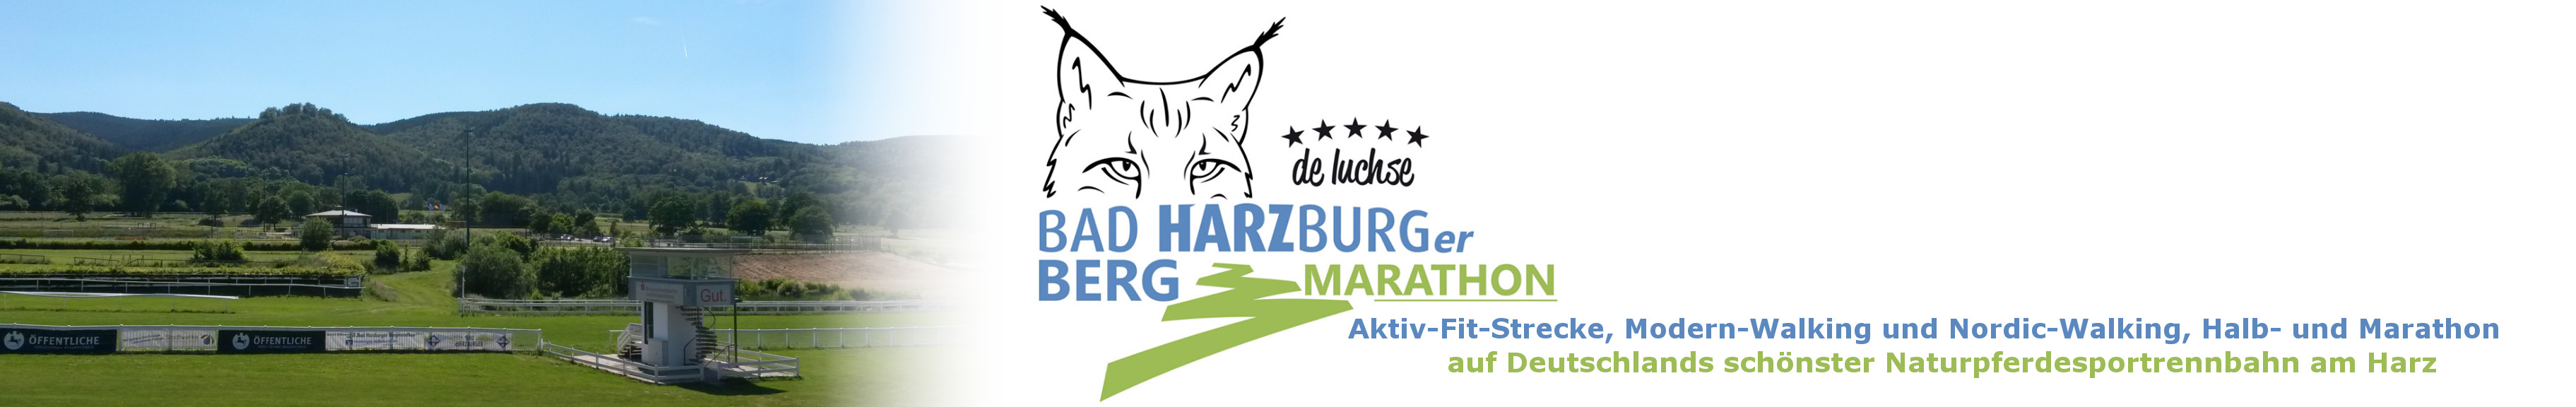 Bergmarathon Bad Harzburg